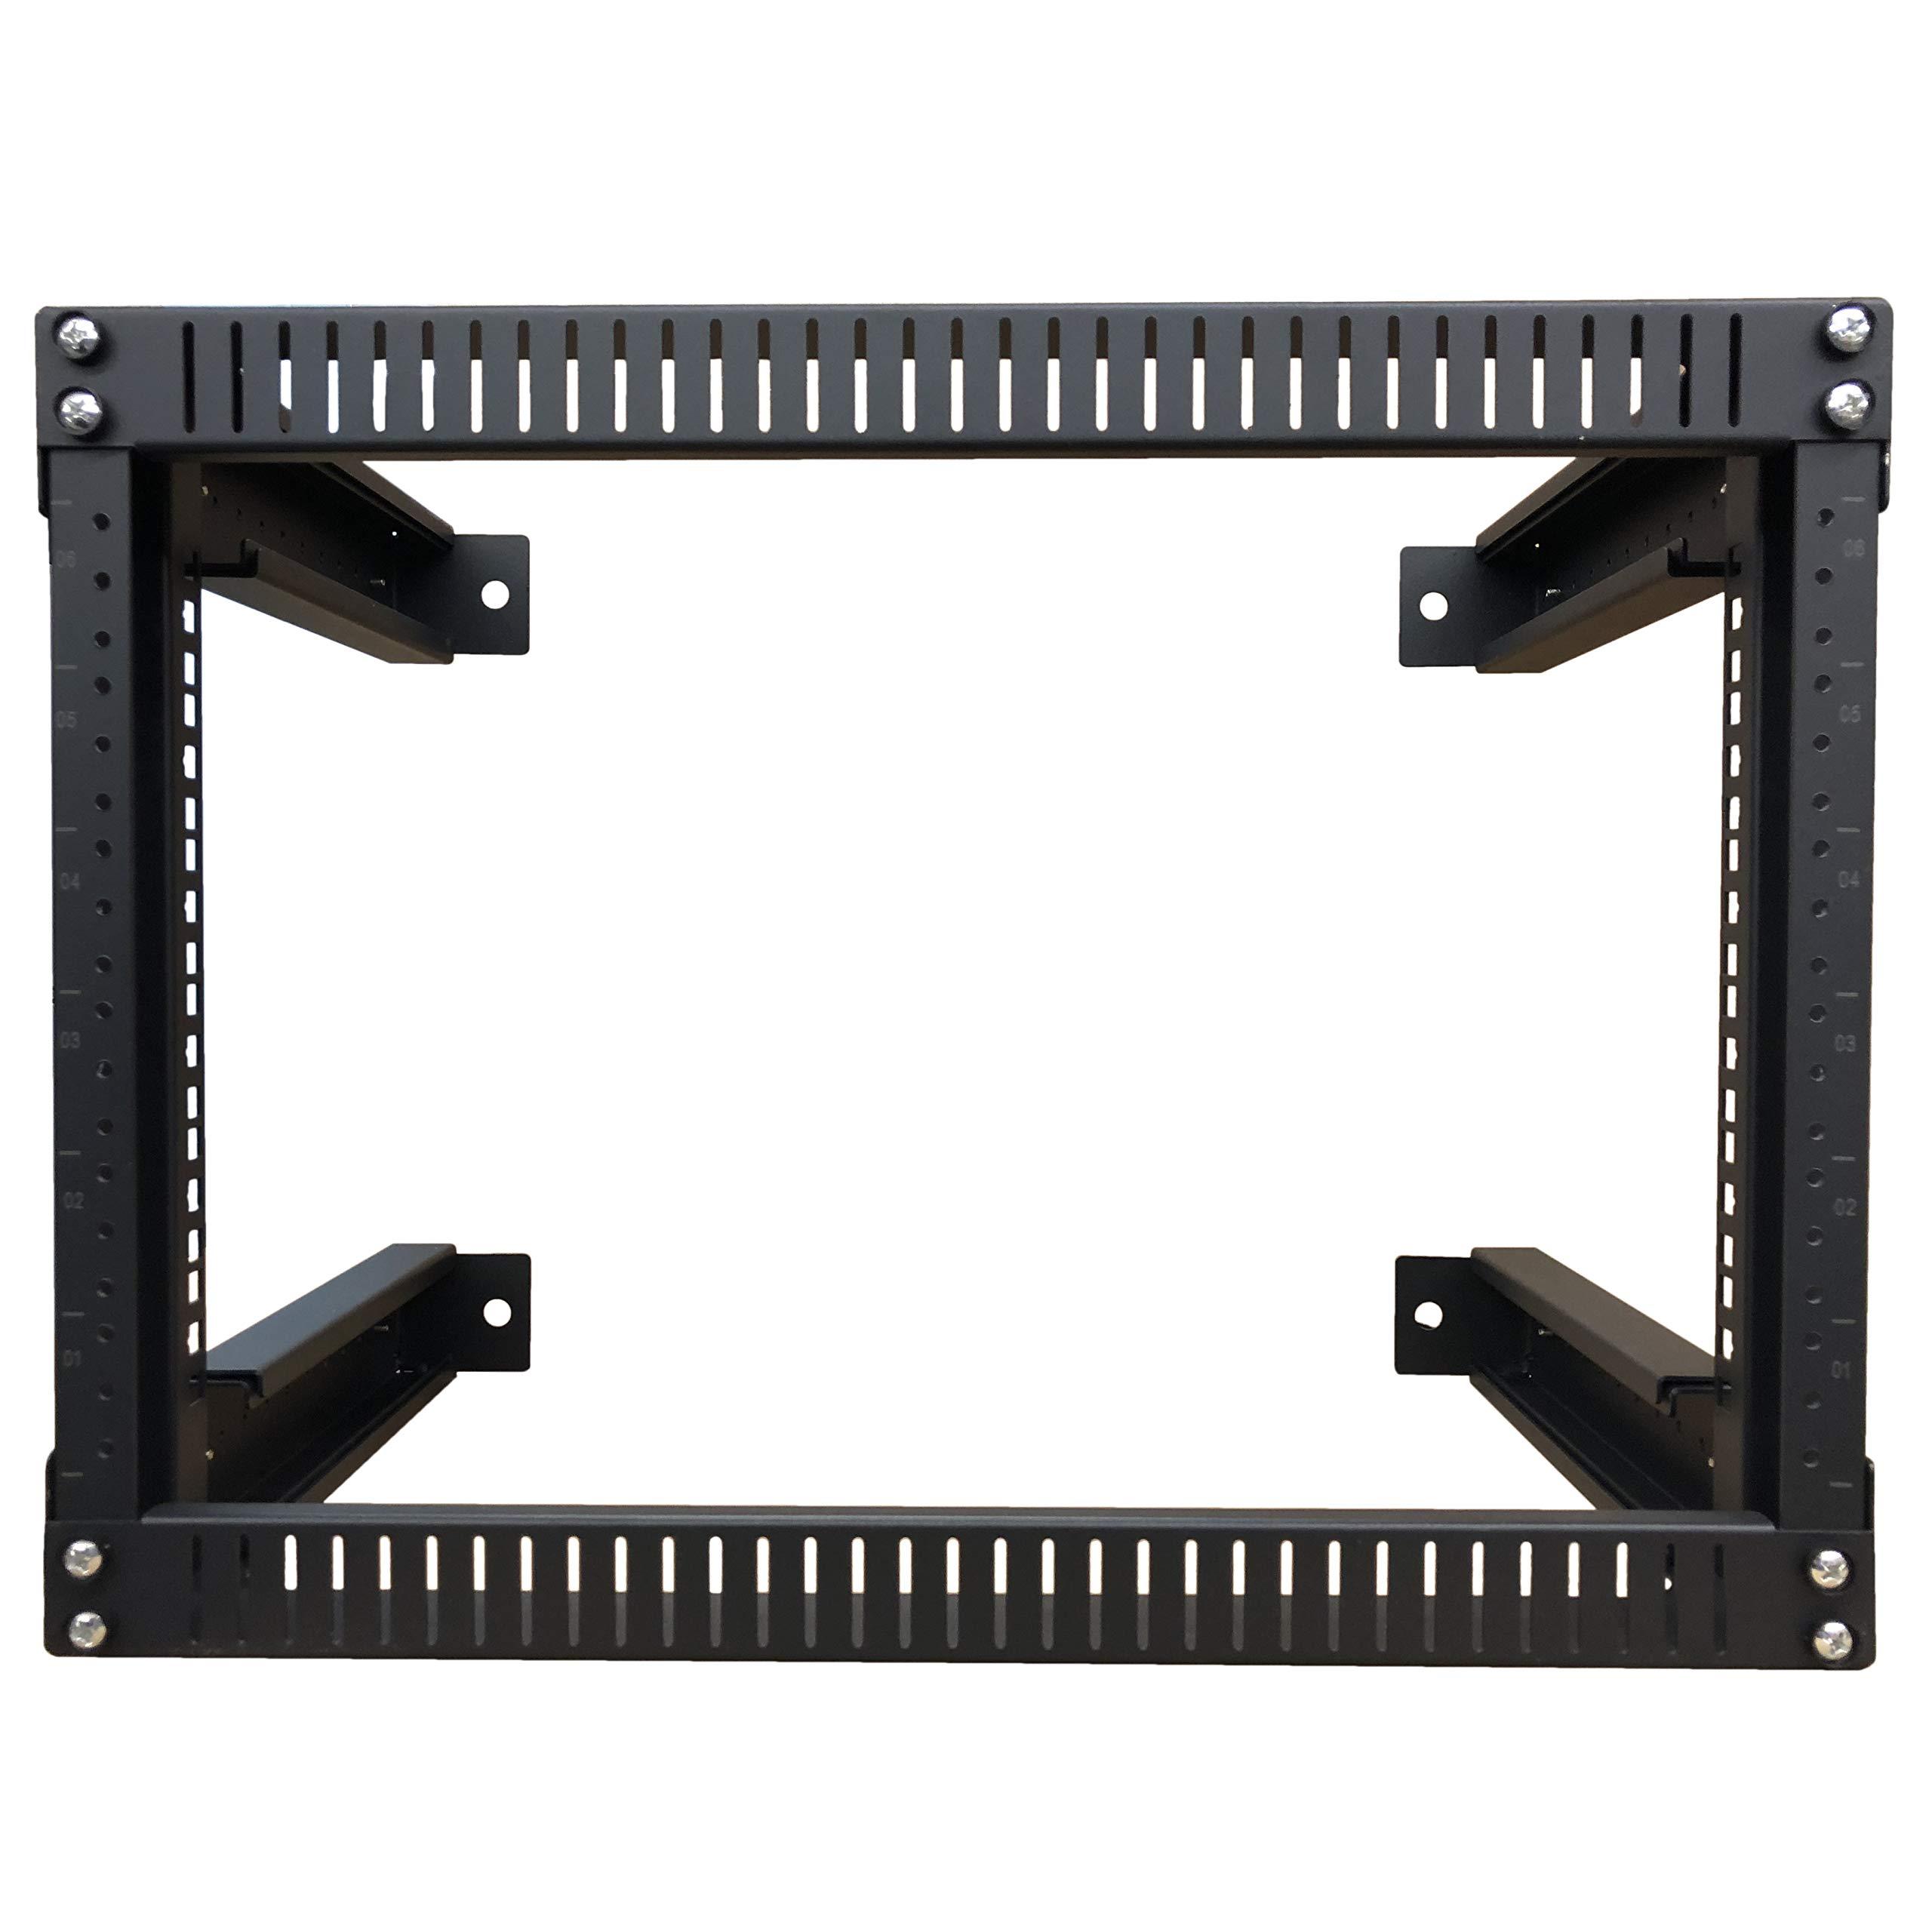 Kenuco 9U Adjustable Depth Wall Mount Open Frame Steel Network Equipment Rack 17.75 Inch Deep by KENUCO (Image #3)